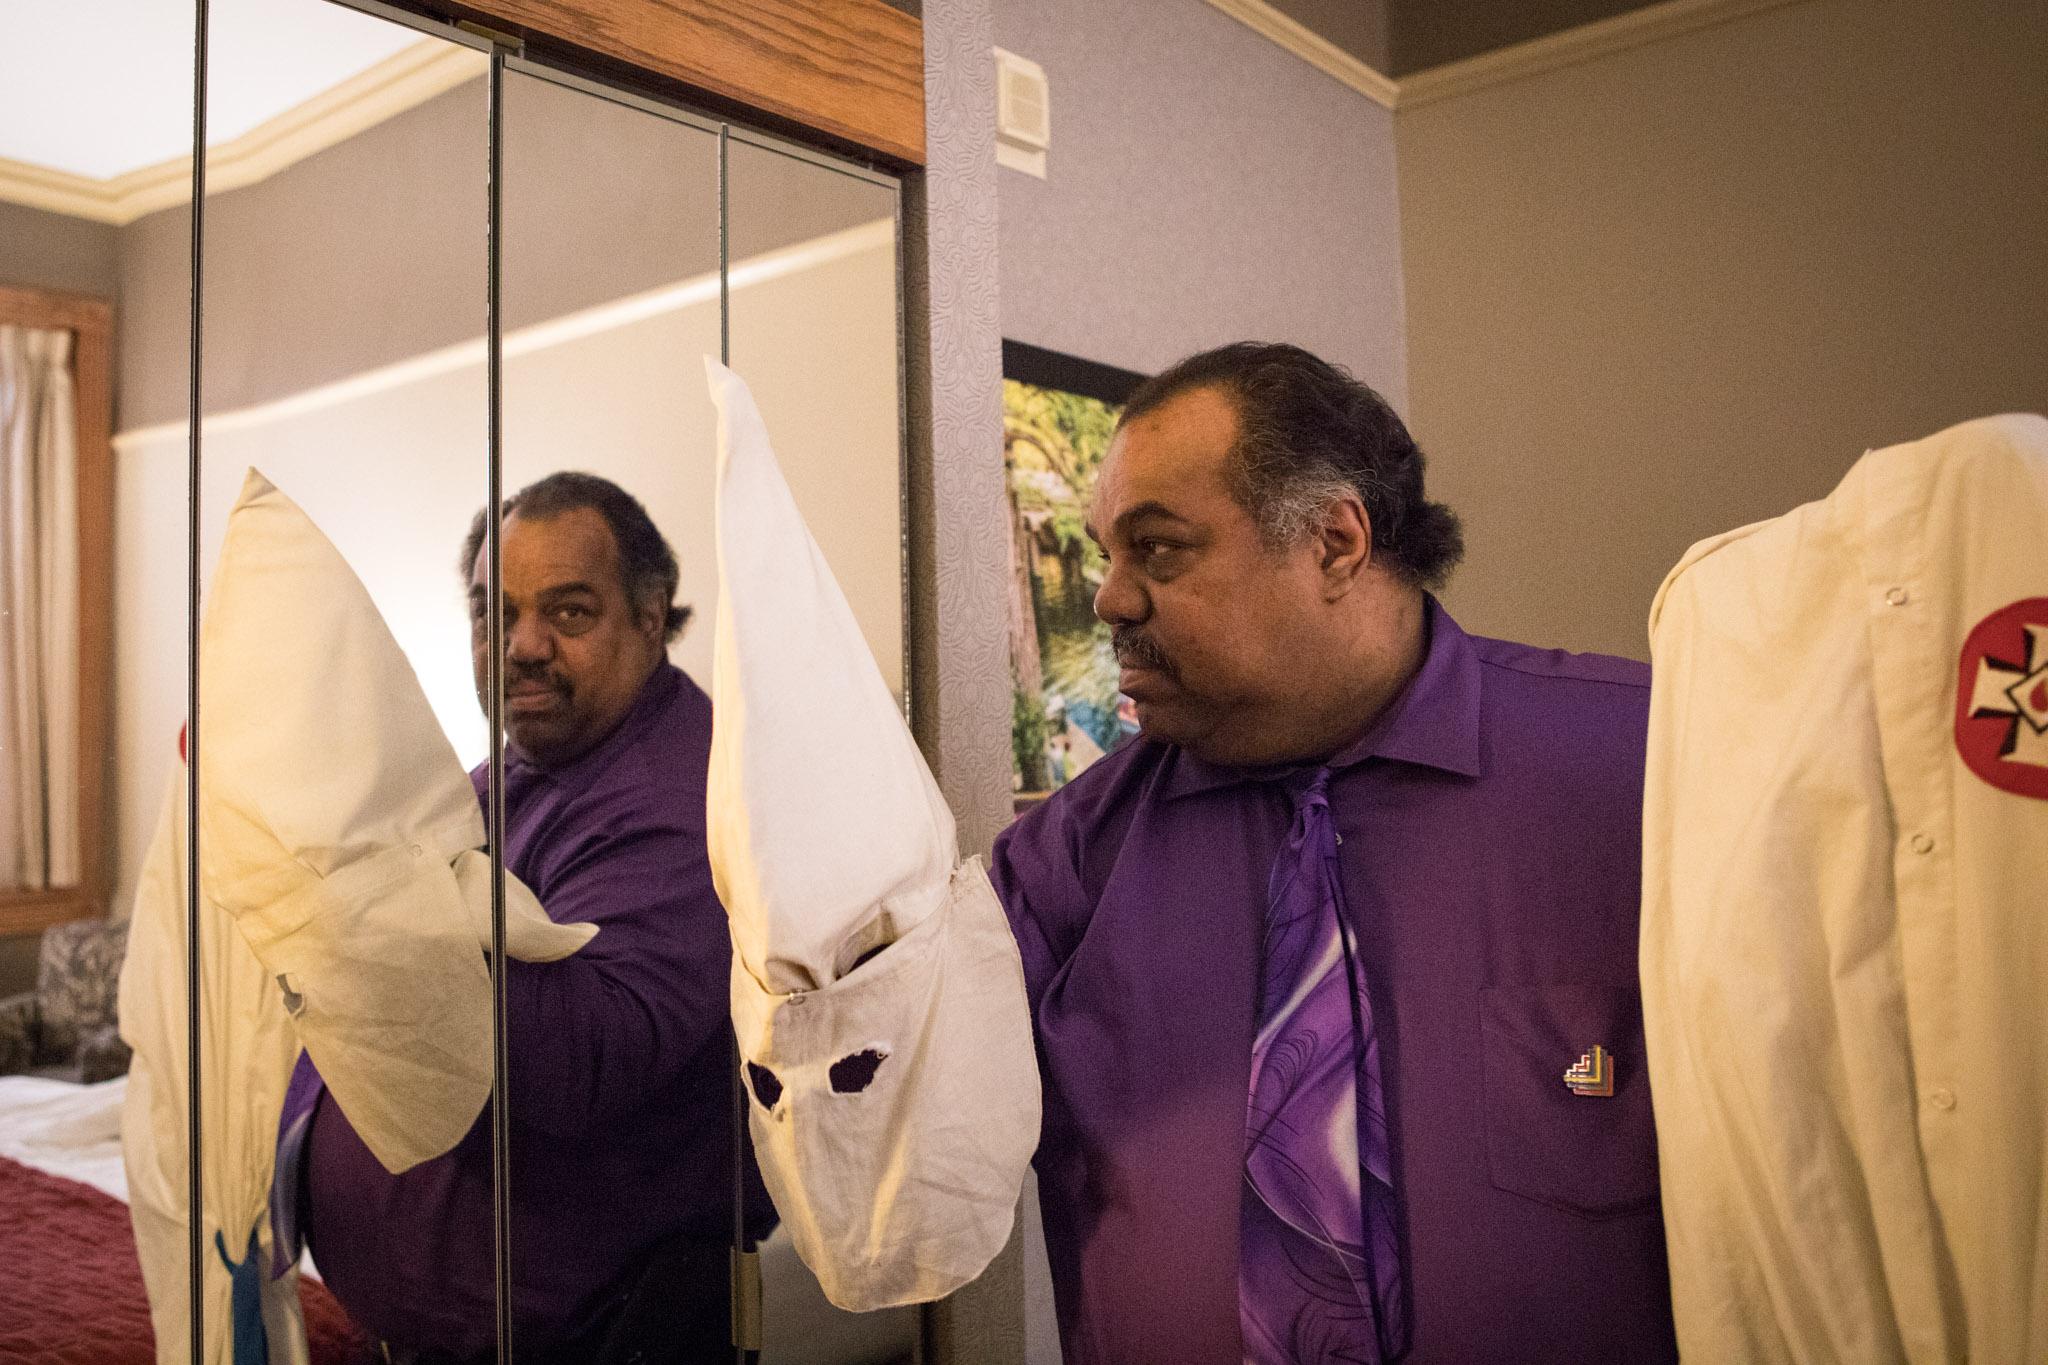 Daryl Davis holds a Ku Klux Klan hood given to him by a previous Klan member.